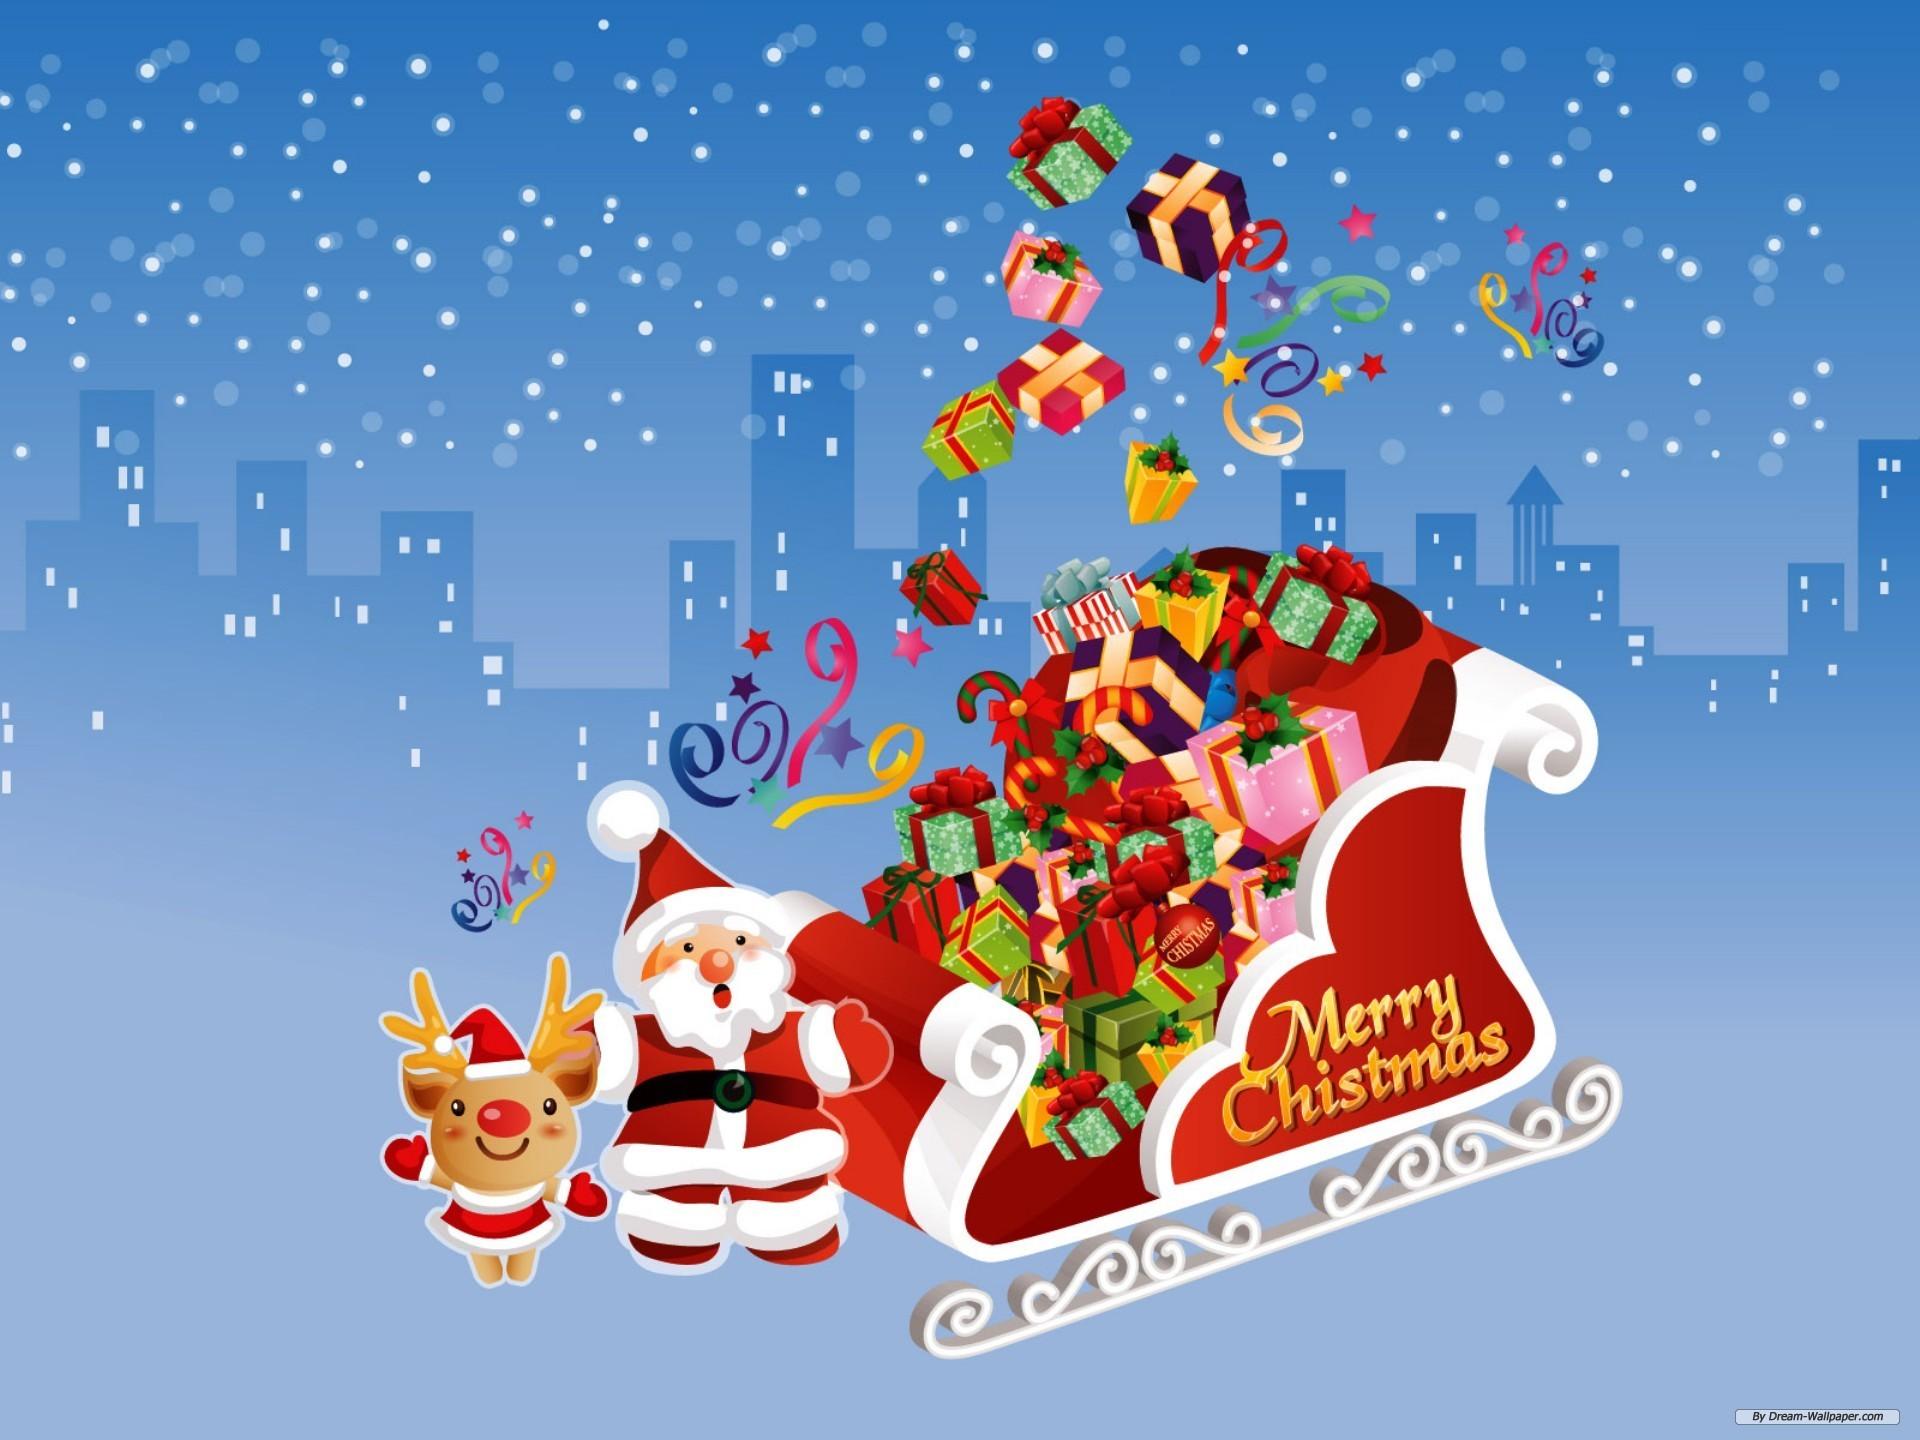 Holiday Wallpaper Christmas Theme 4 Wallpaper 1920x1440 Cute Merry Christmas Animated 1920x1440 Wallpaper Teahub Io